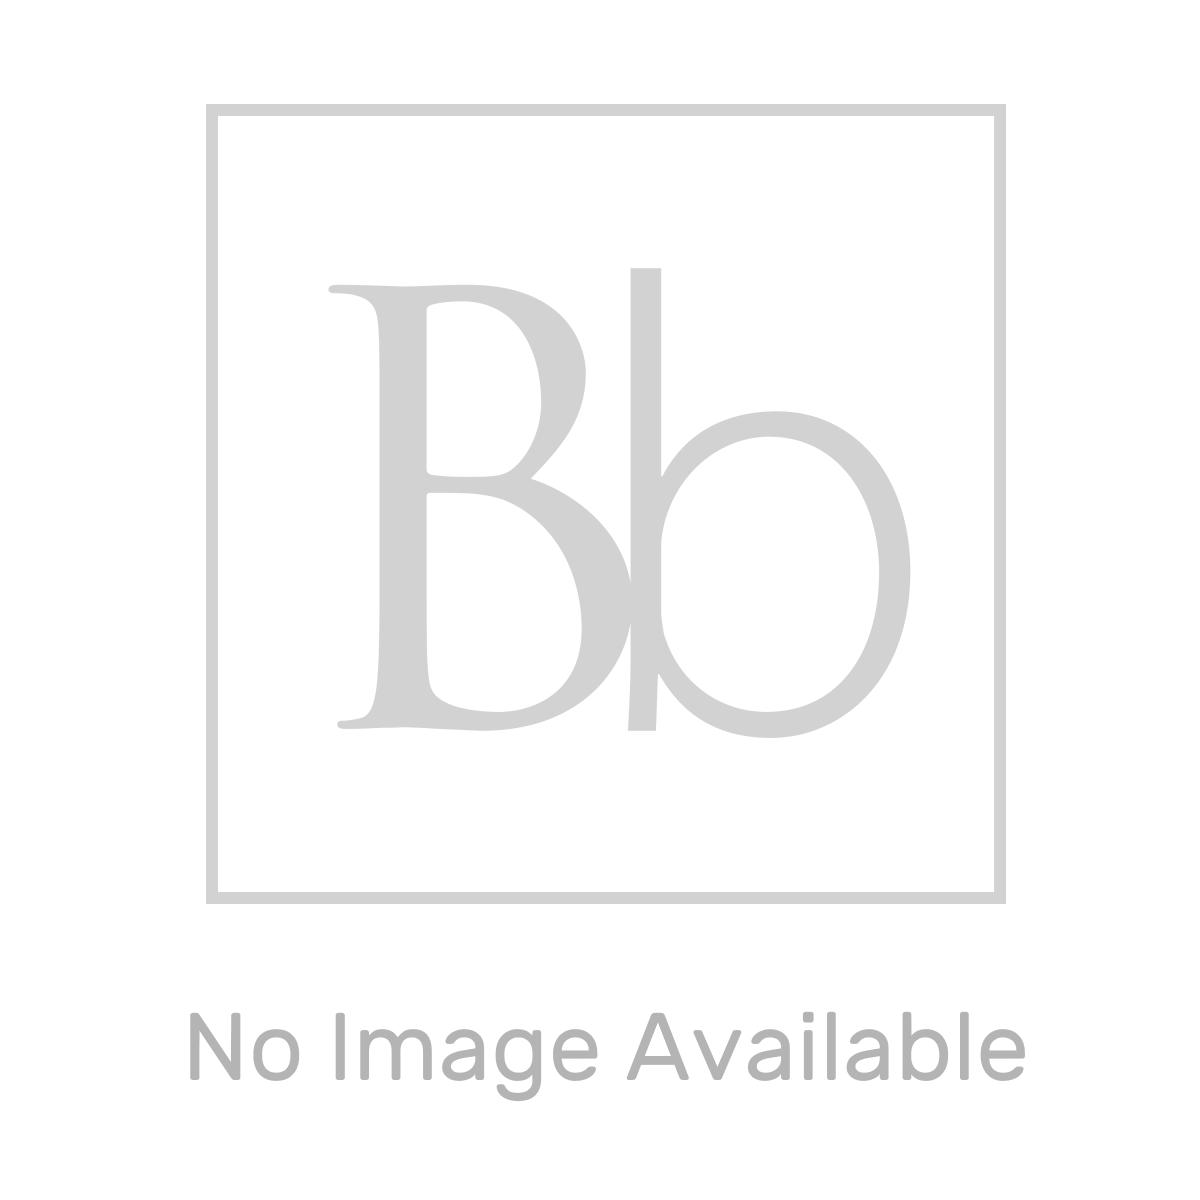 Aquadart White Slate Shower Tray 1700 x 760 Dimension